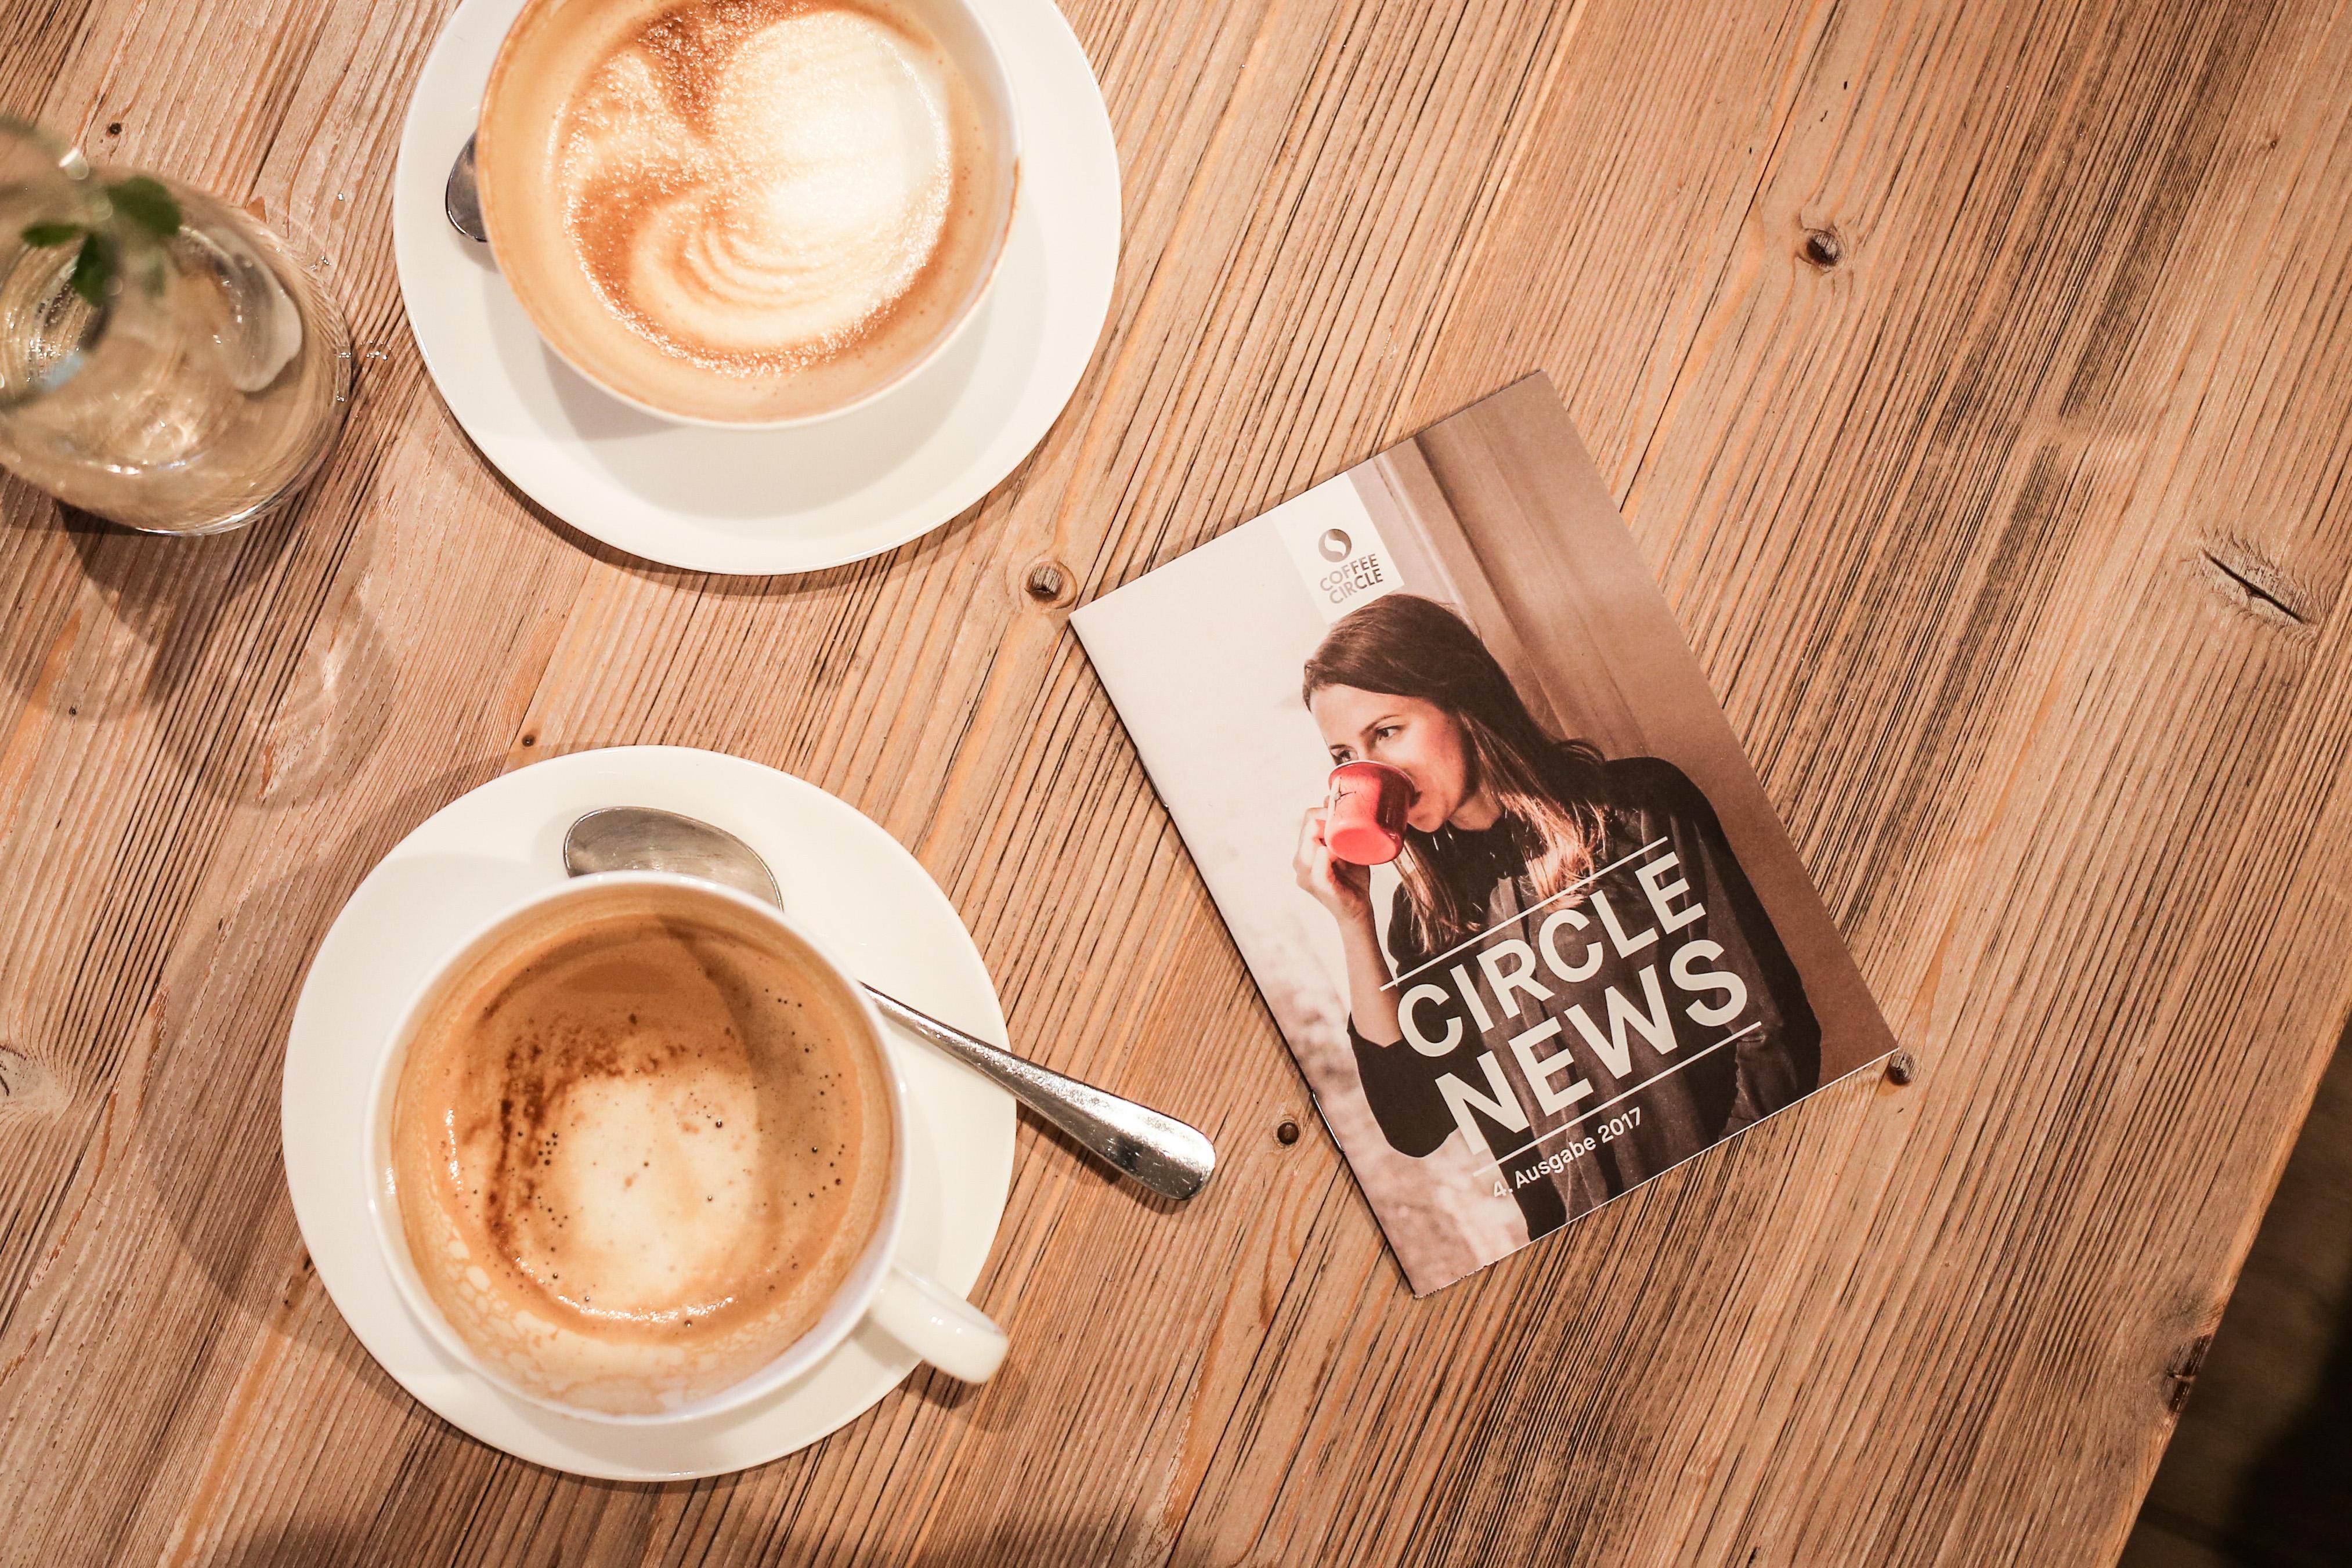 Circle News im Du Bonheur